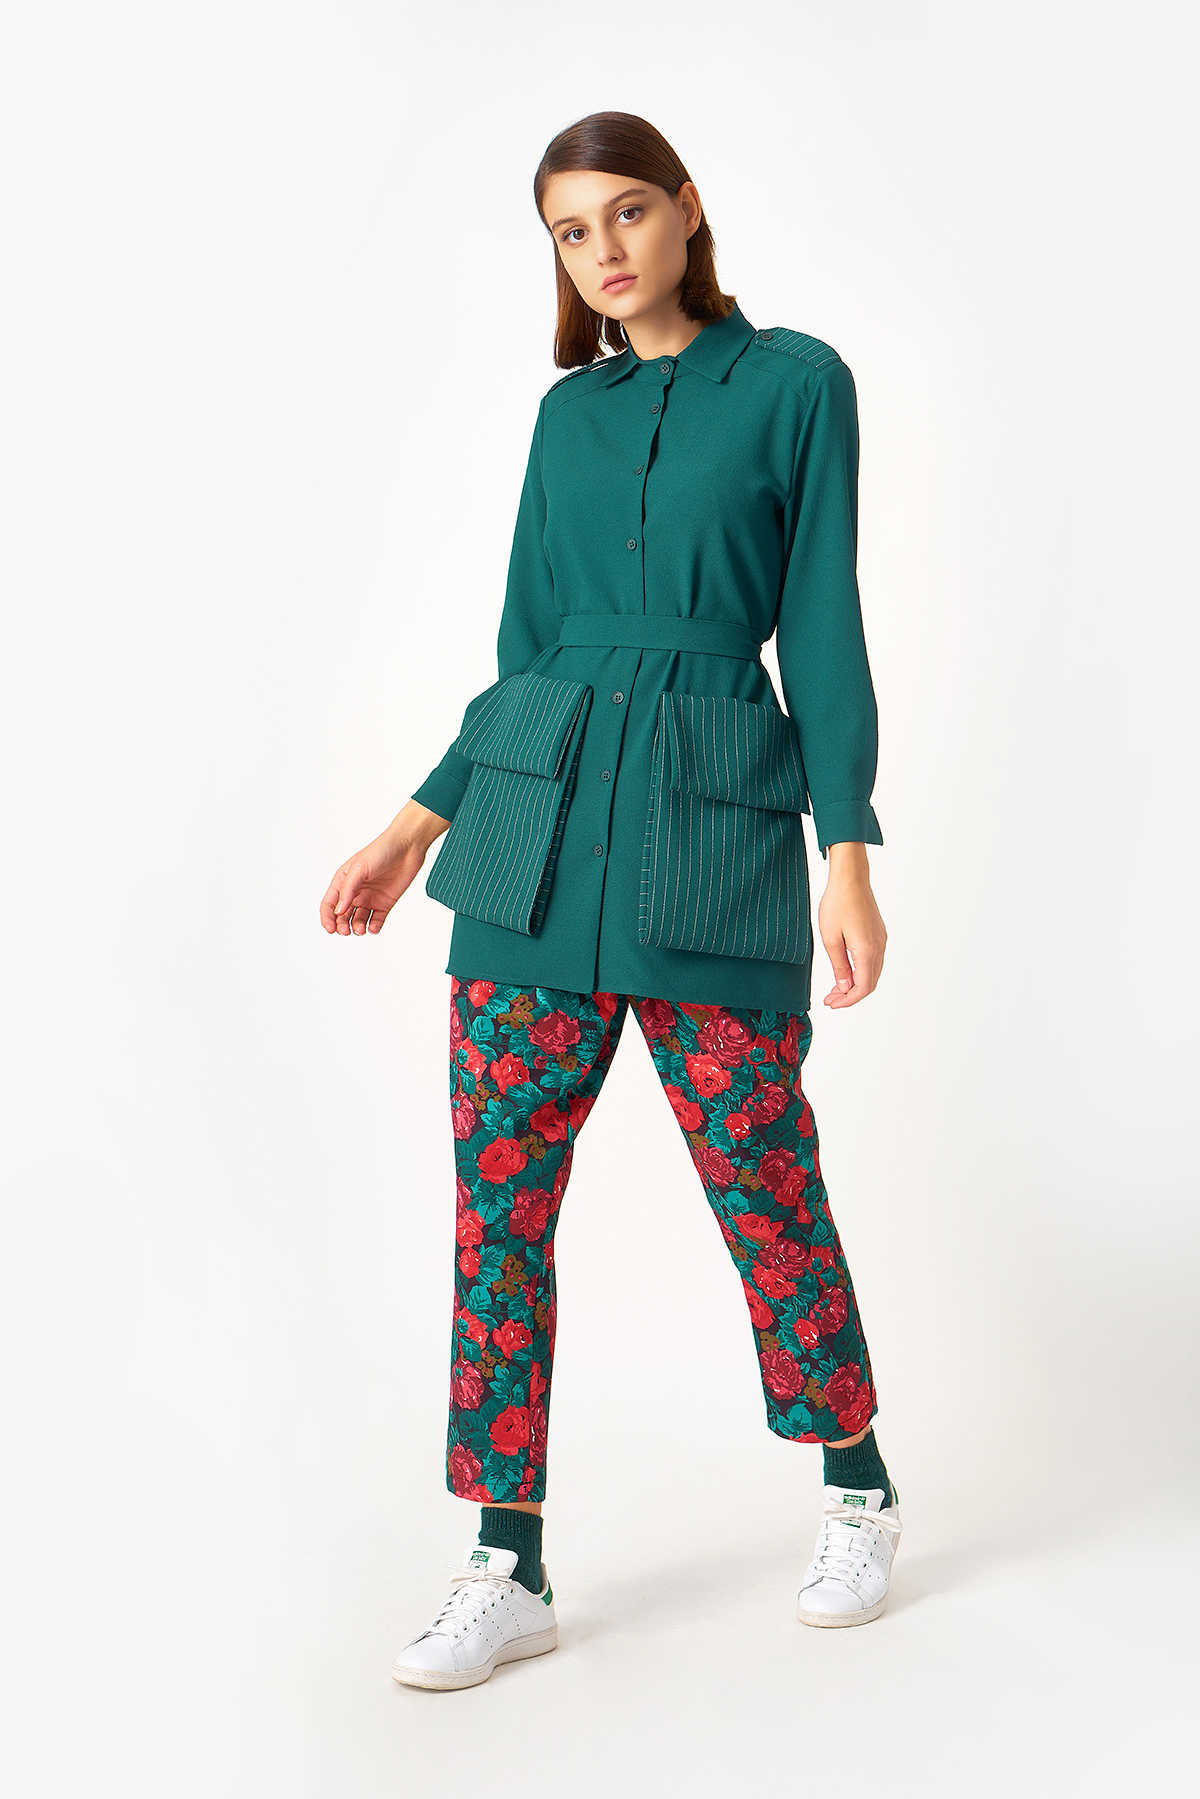 Kuaybe Gider - 5119 Tunik Yeşil